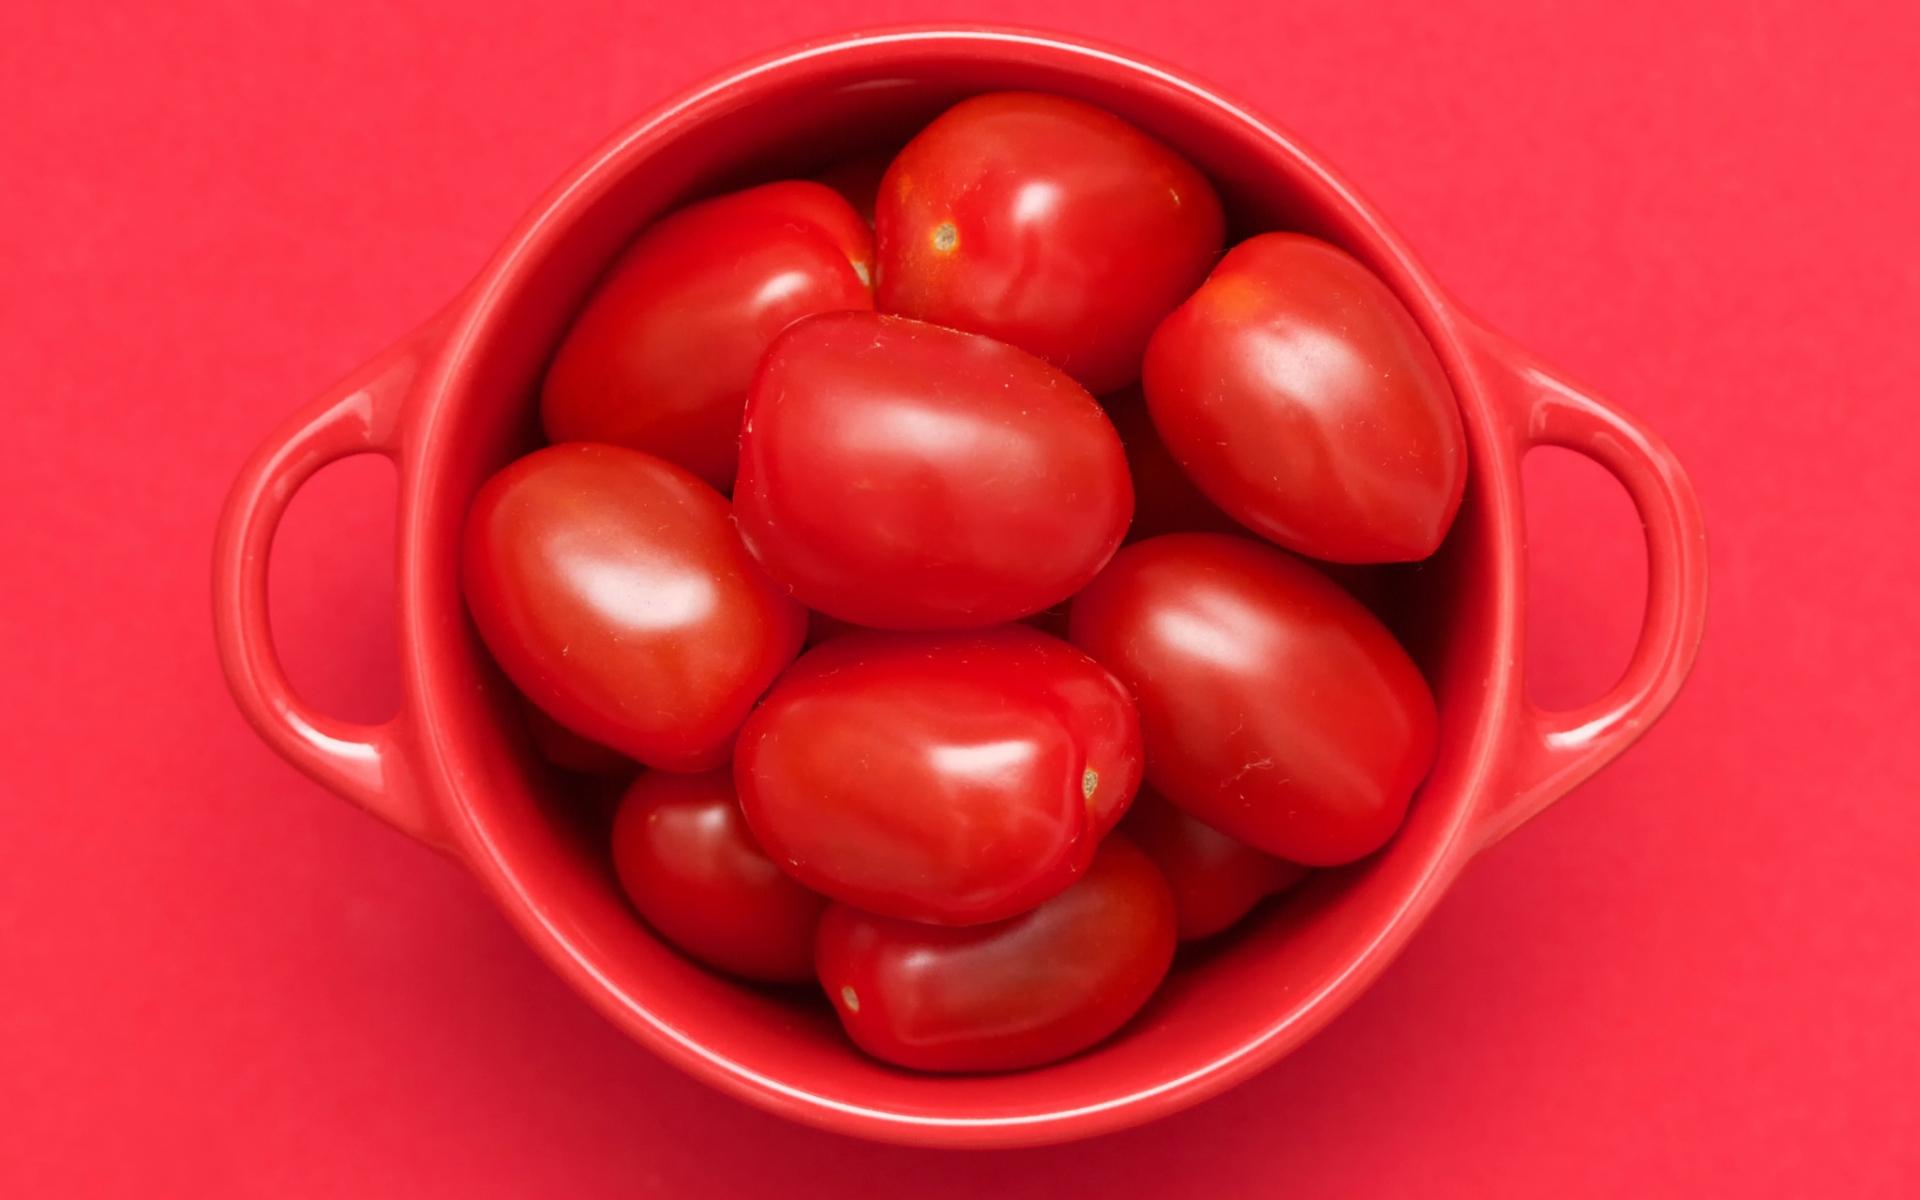 Картинки Помидоры, помидоры, блюда фото и обои на рабочий стол